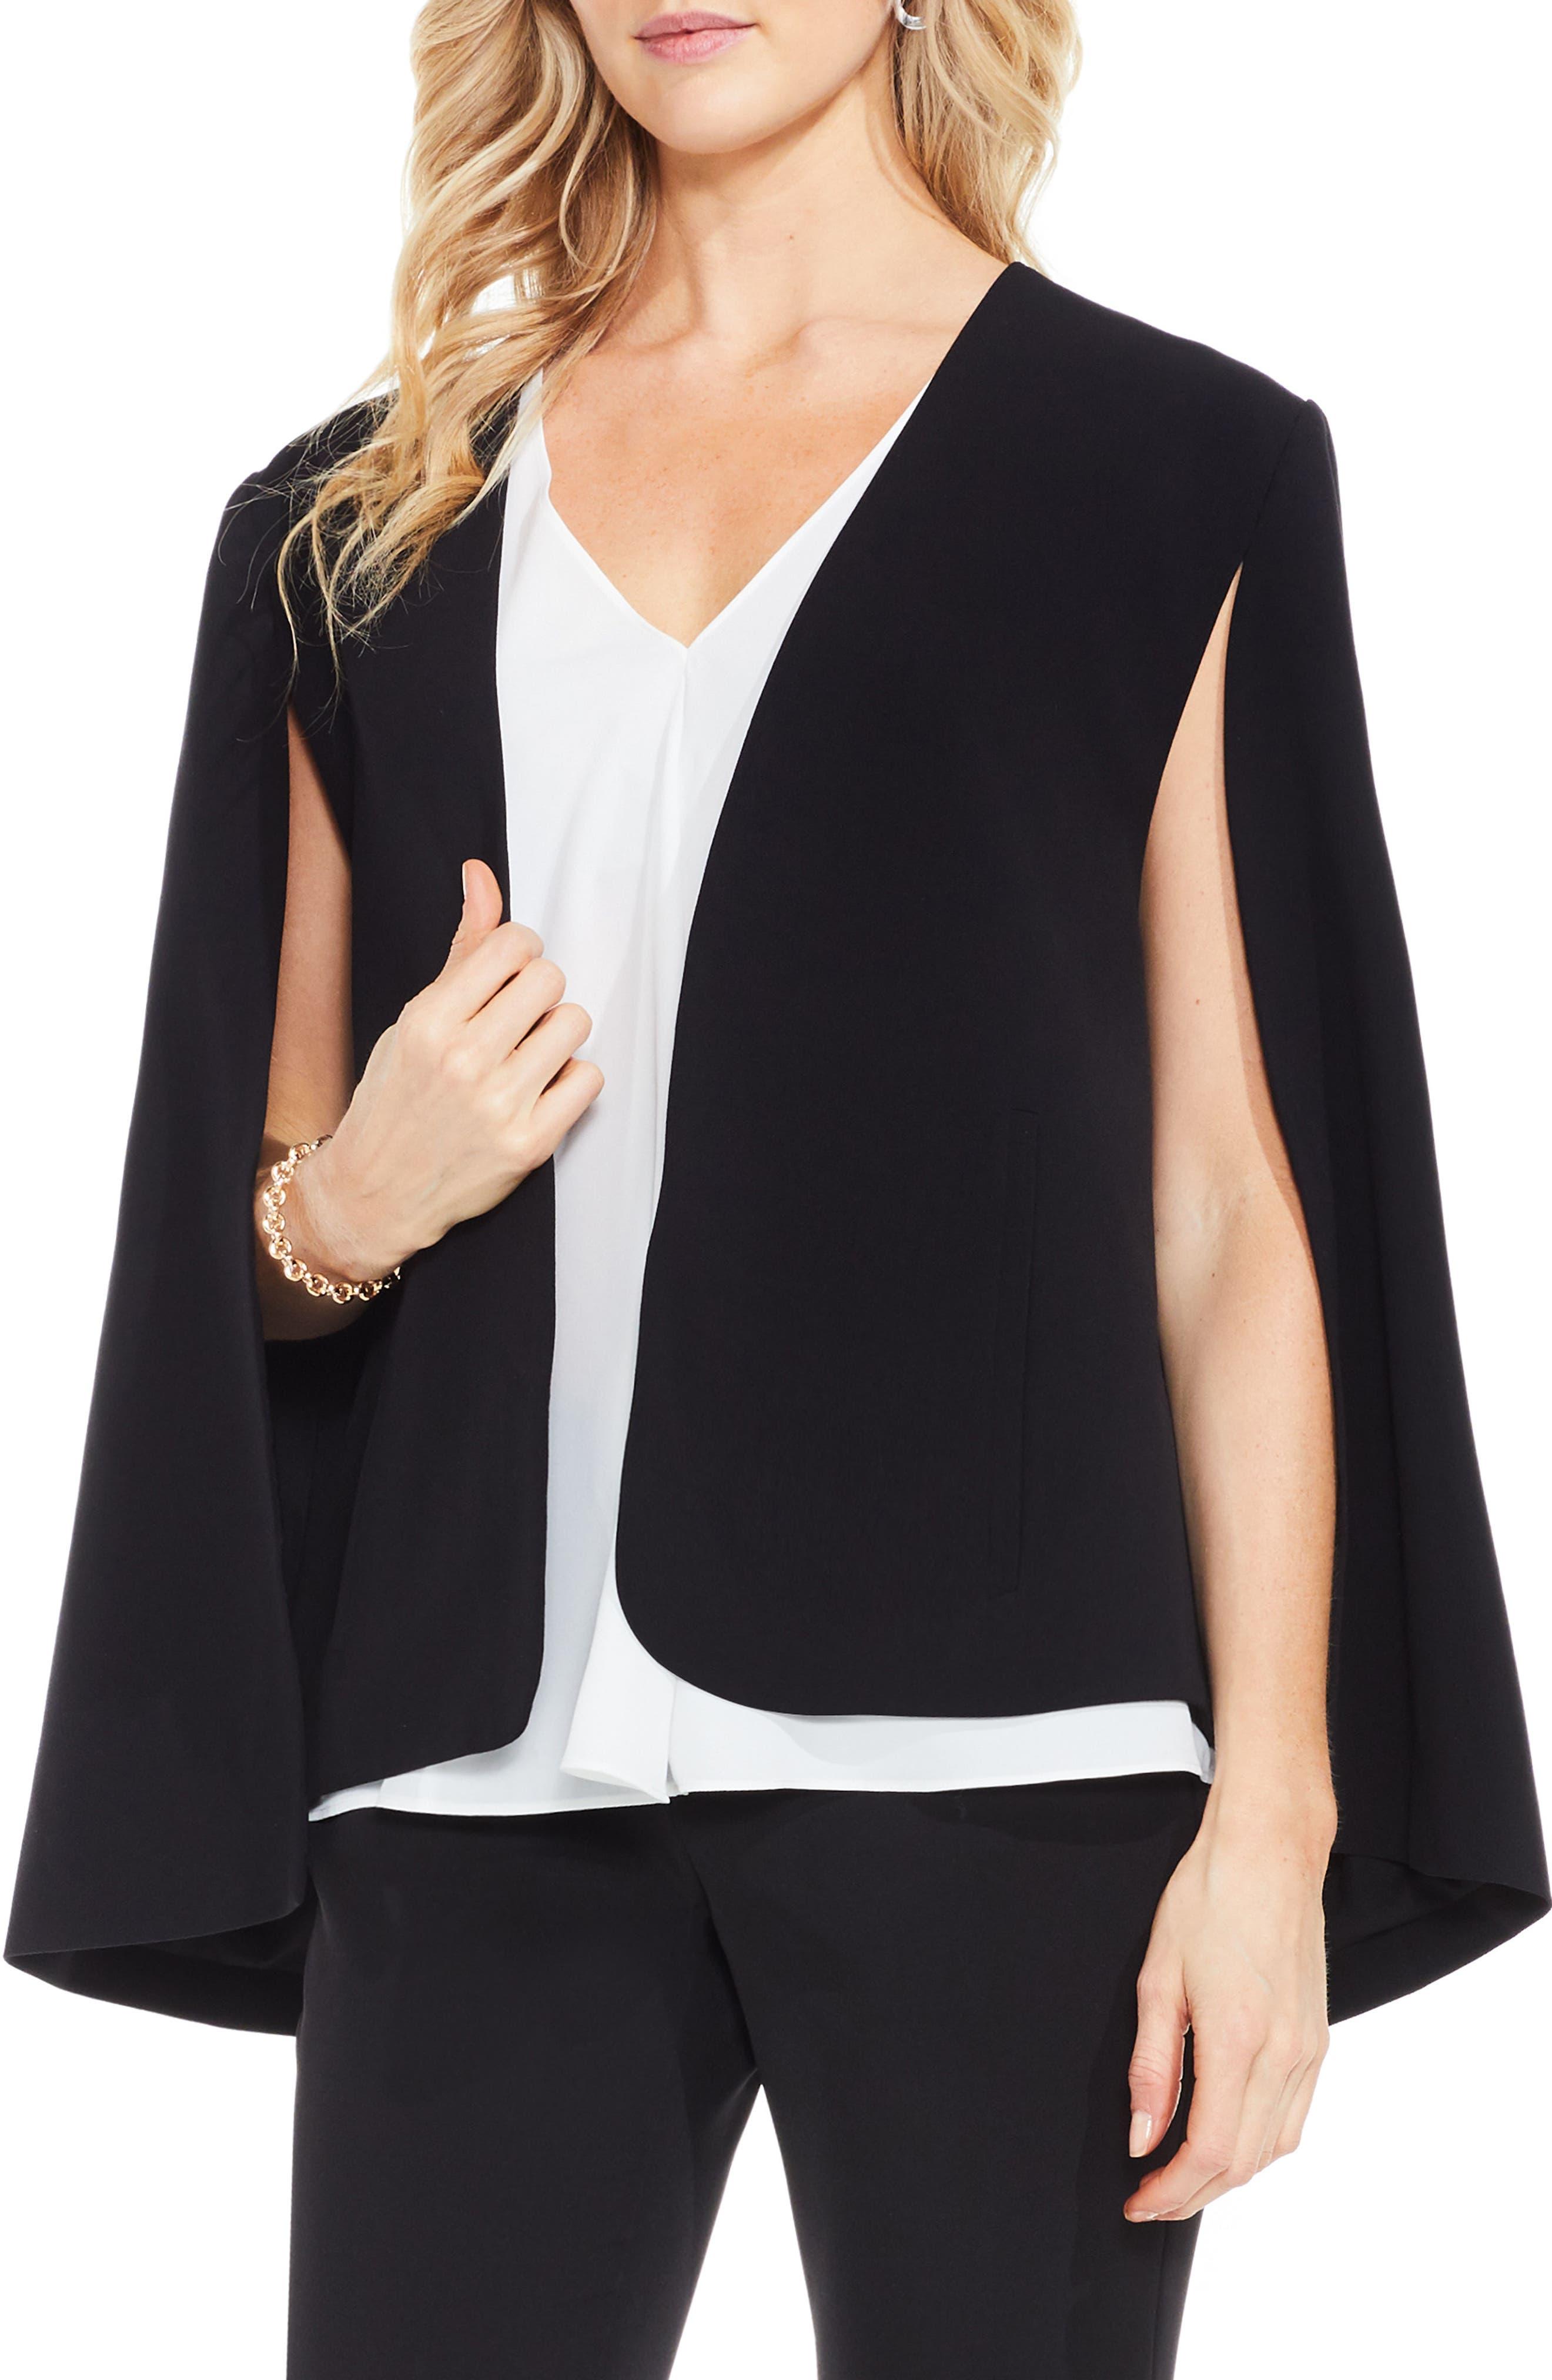 Milano Twill Cape Jacket,                             Main thumbnail 1, color,                             RICH BLACK